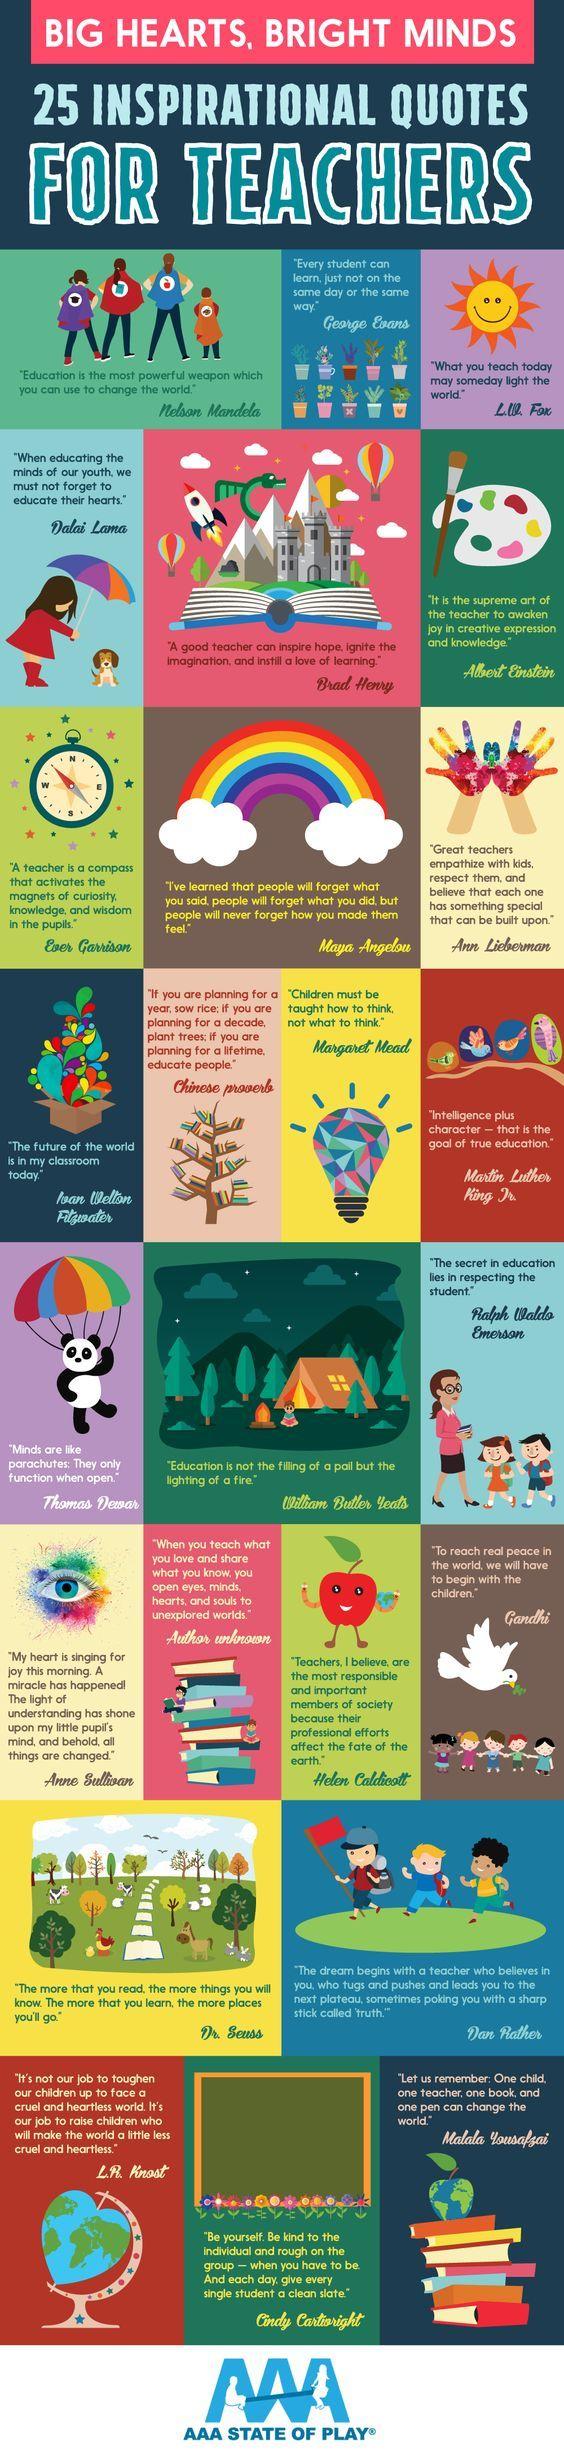 25 Inspirational Quotes for Teachers #MeetingStreetSchools Ben Navarro Sherman Financial Group